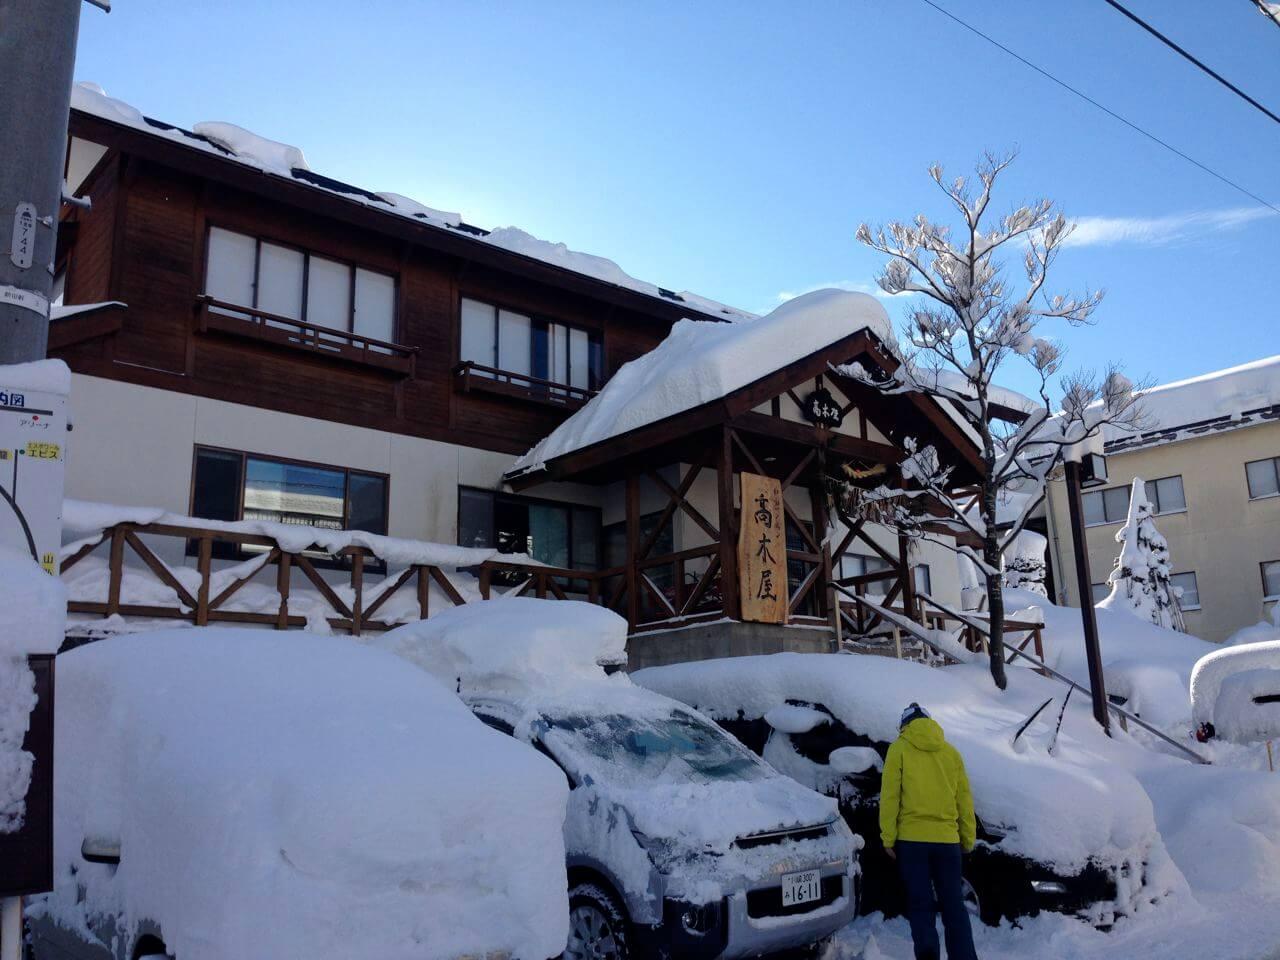 Takagiya Traditional Ski Lodge Nozawa Onsen